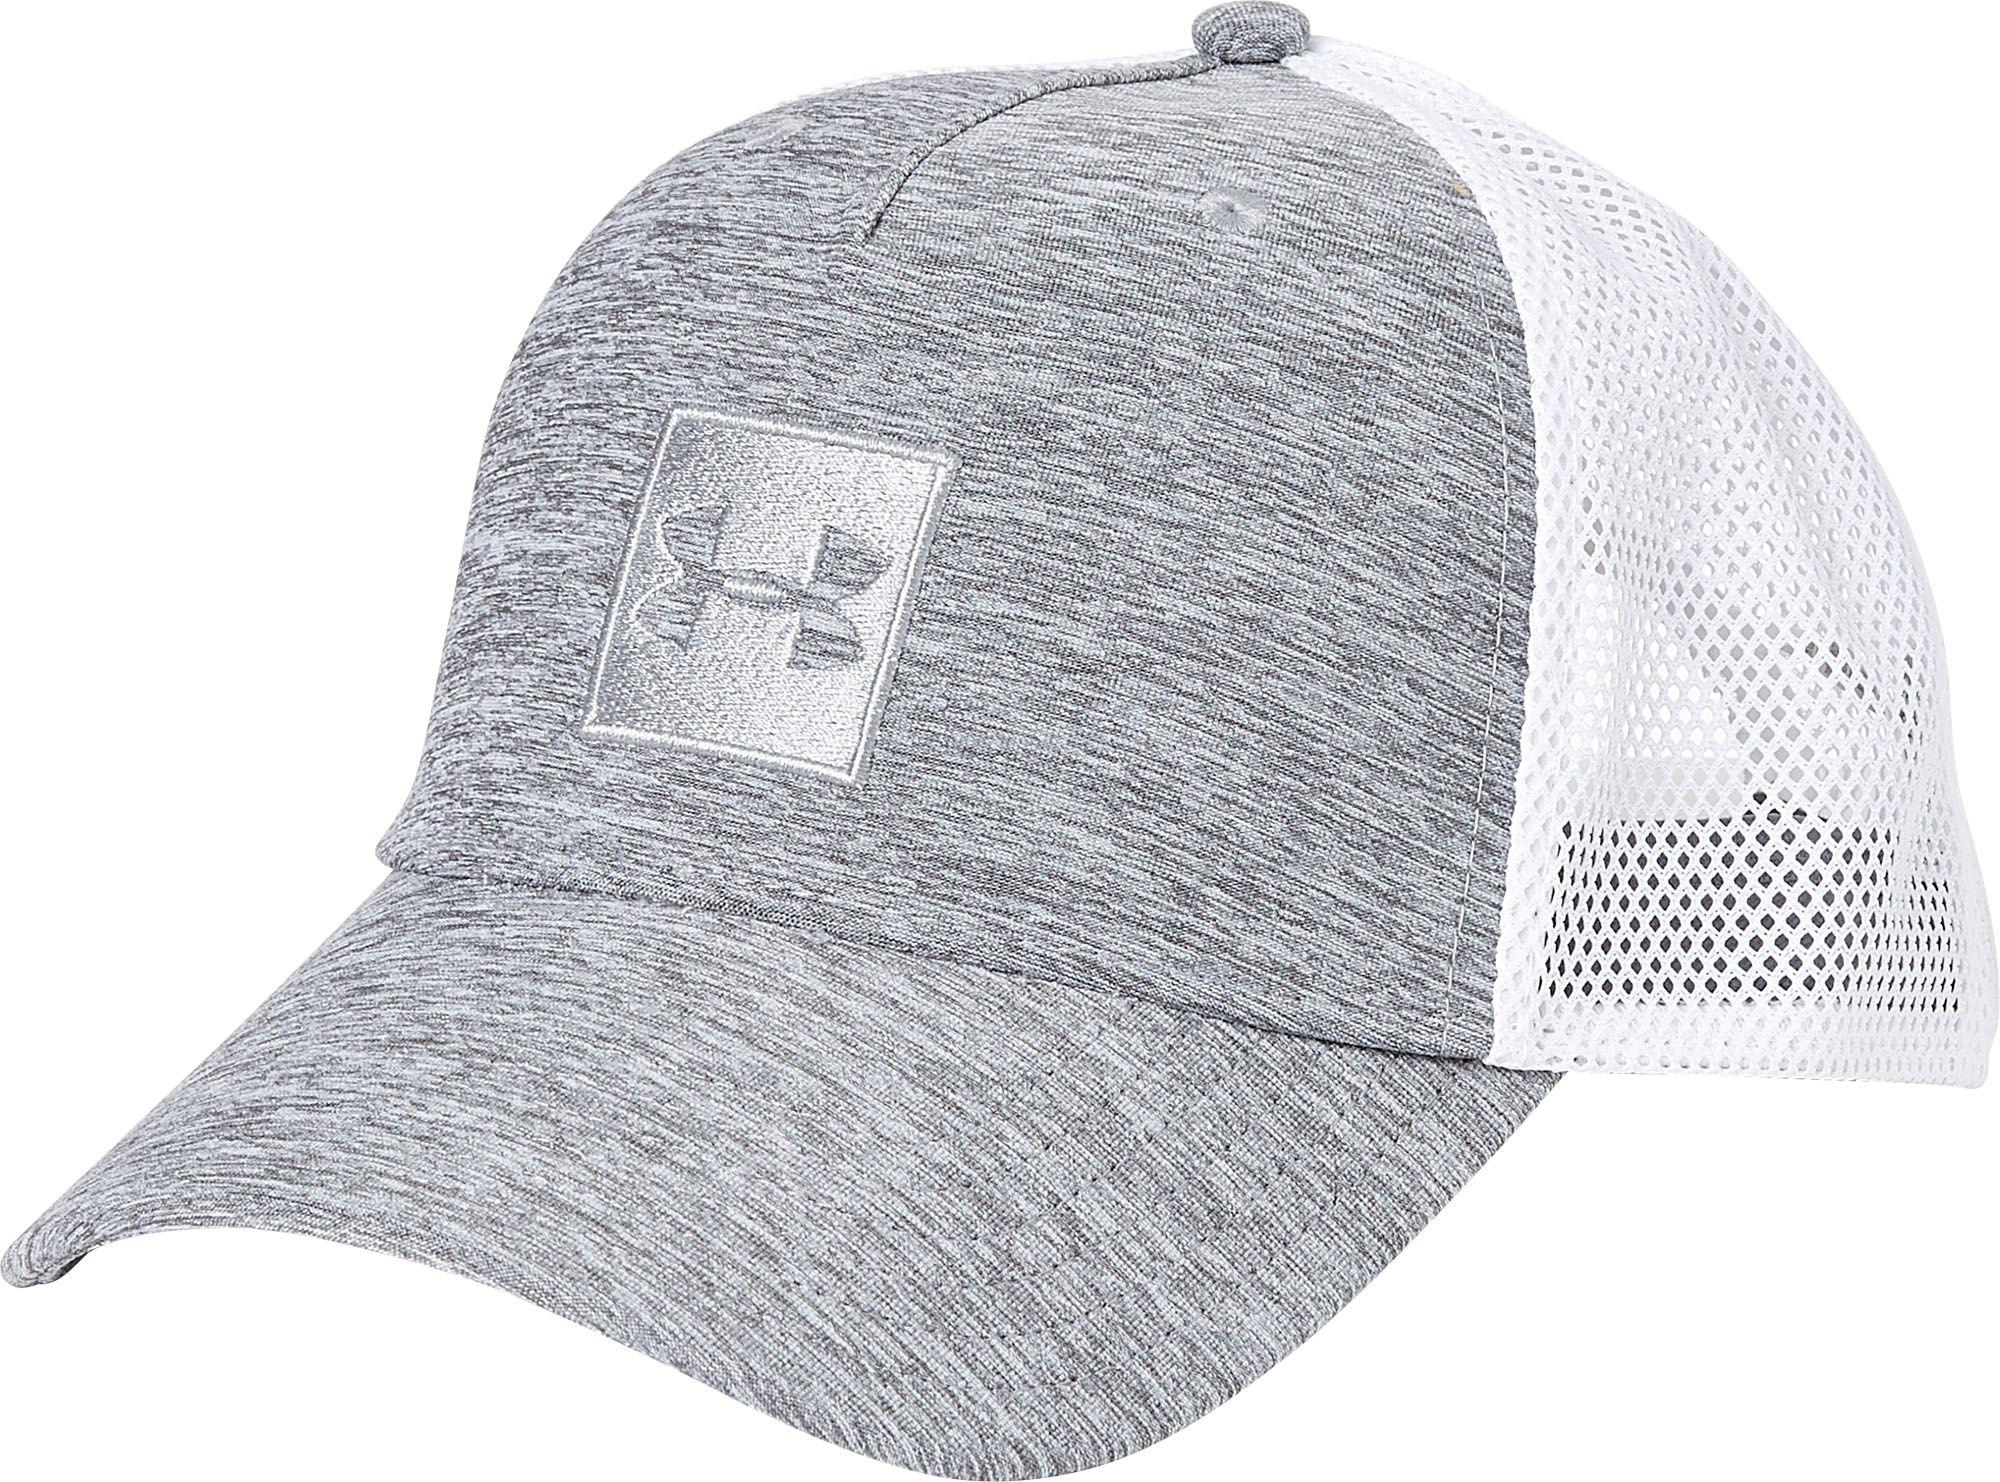 33c19c1cfcd92 Under Armour Twist Print Pro Trucker Hat for Men - Lyst